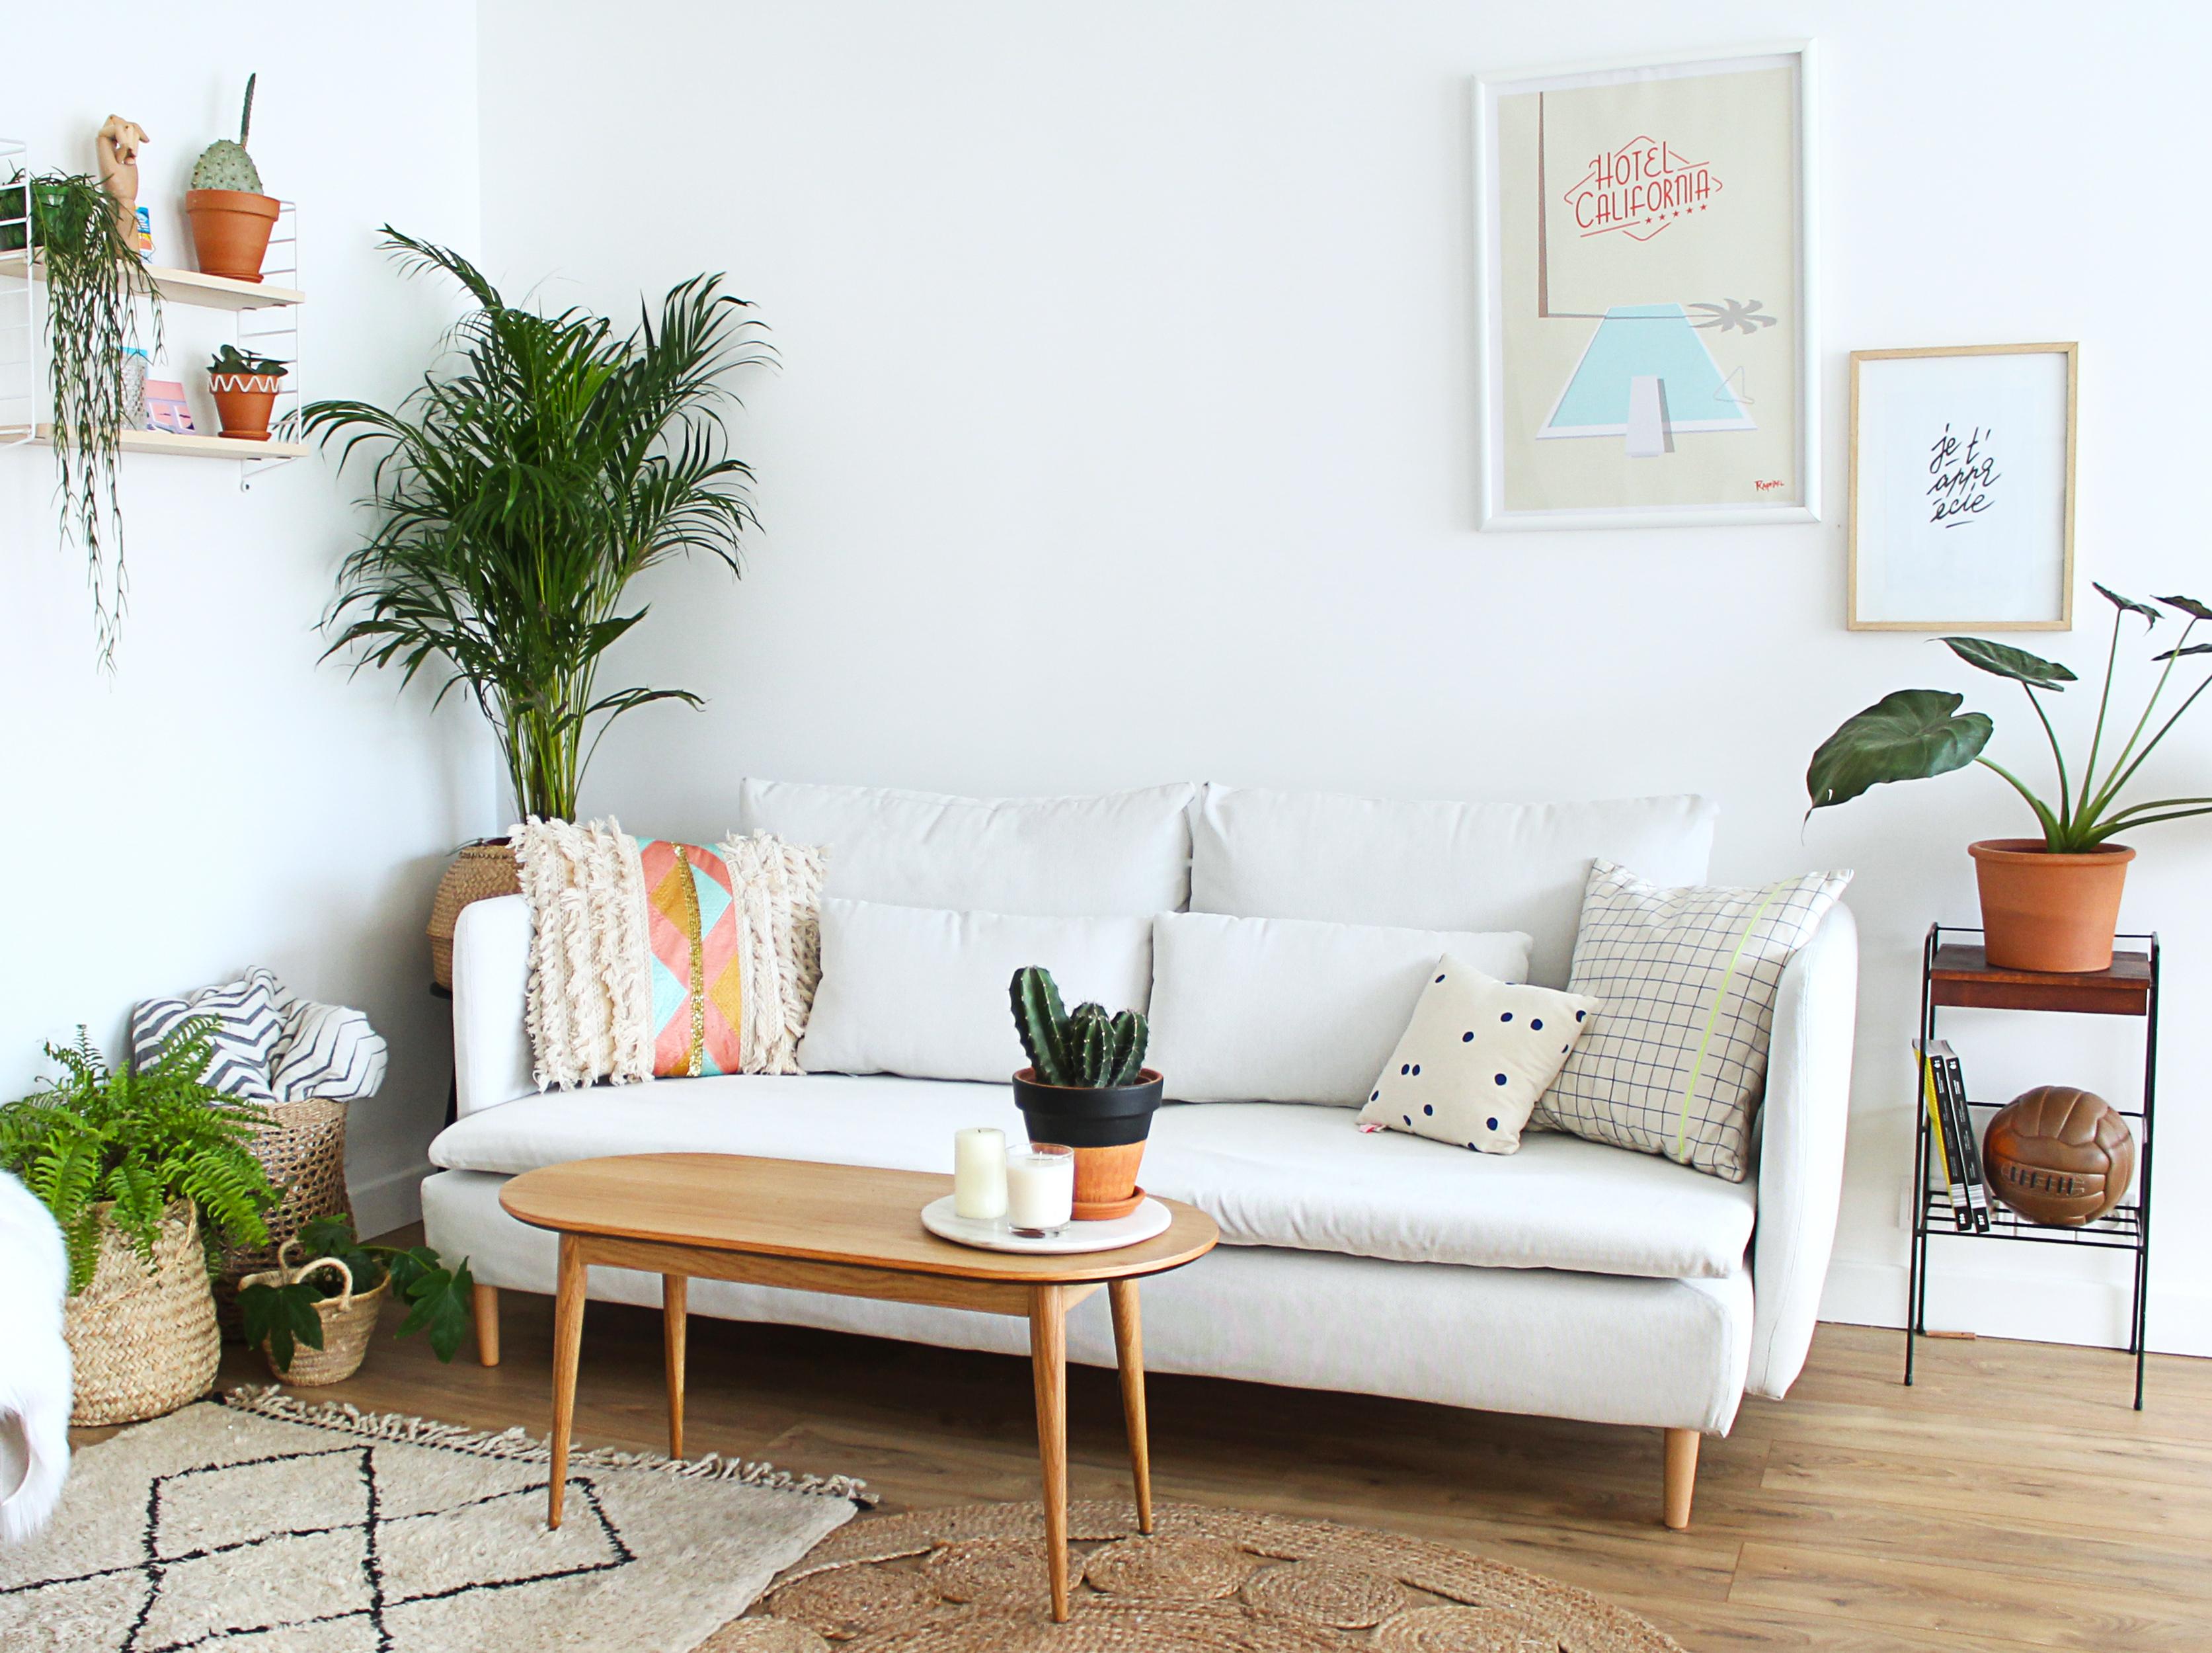 un canap blanc il faut oser mademoiselle claudine le blog. Black Bedroom Furniture Sets. Home Design Ideas